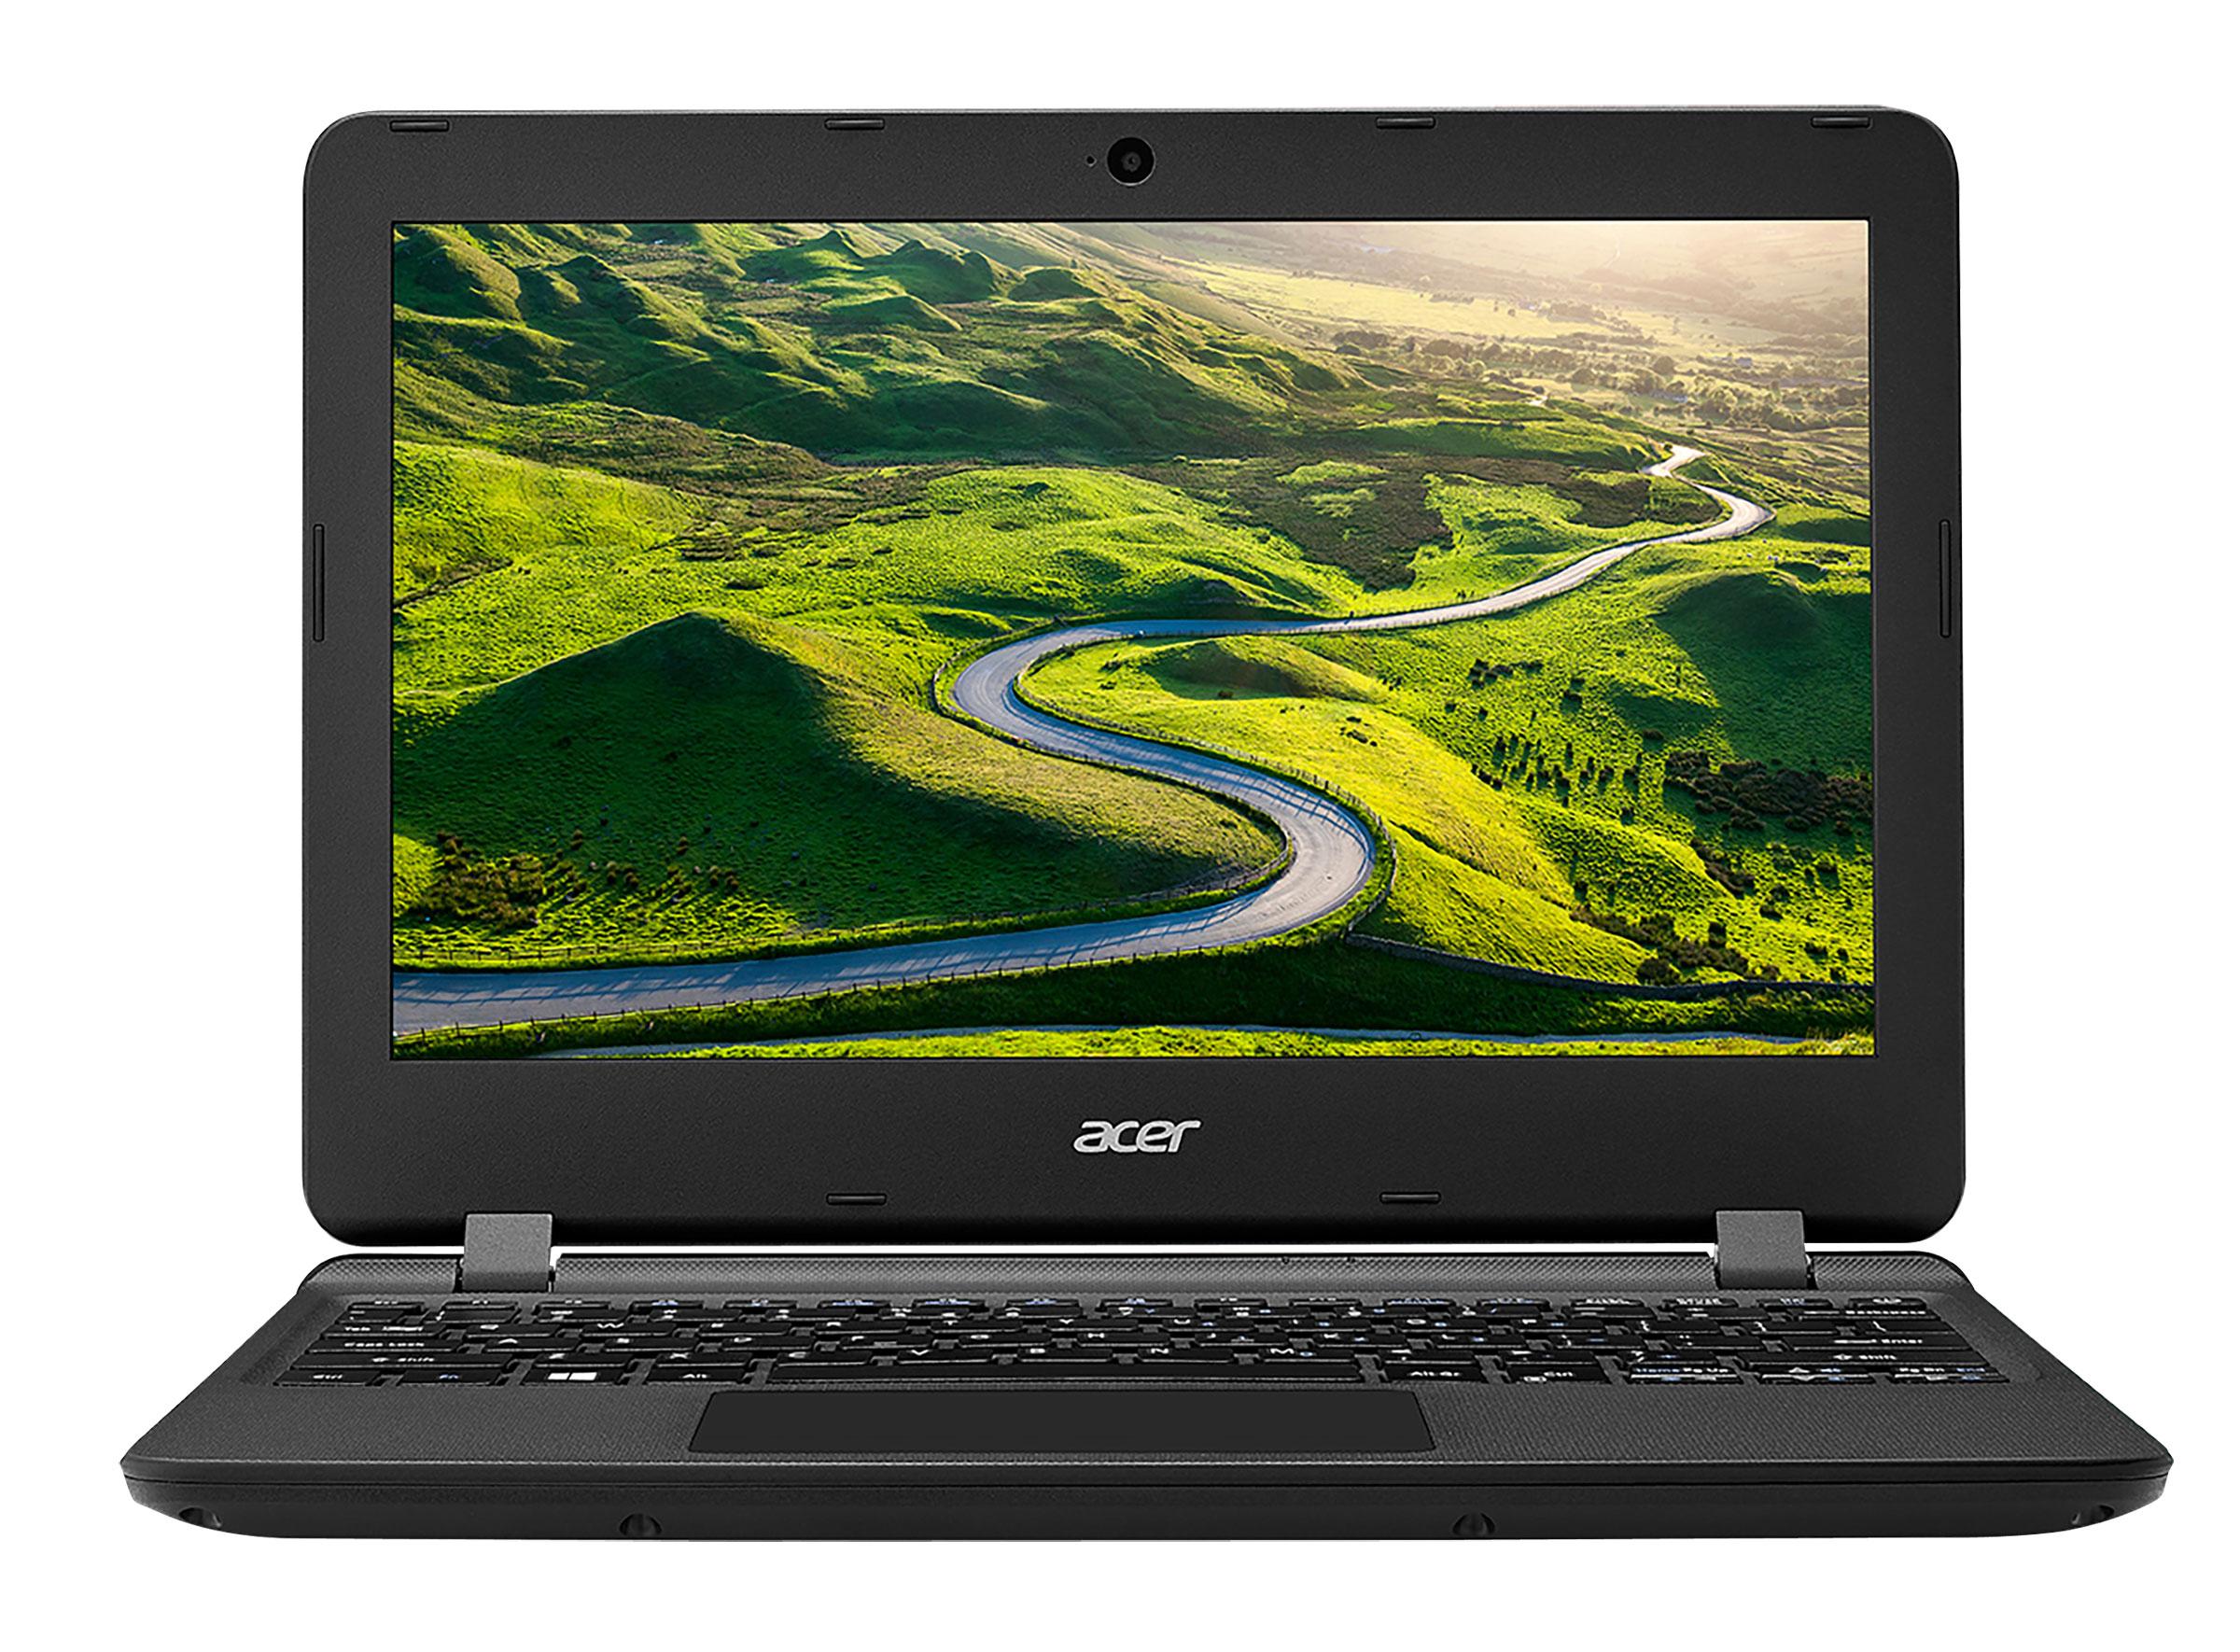 "Acer Aspire Netbook ES 11 (Refurbished 4GB RAM 32GB eMMC SSD 11.6"" Black ) - £114.44 @ Littlewoods Clearance Ebay"